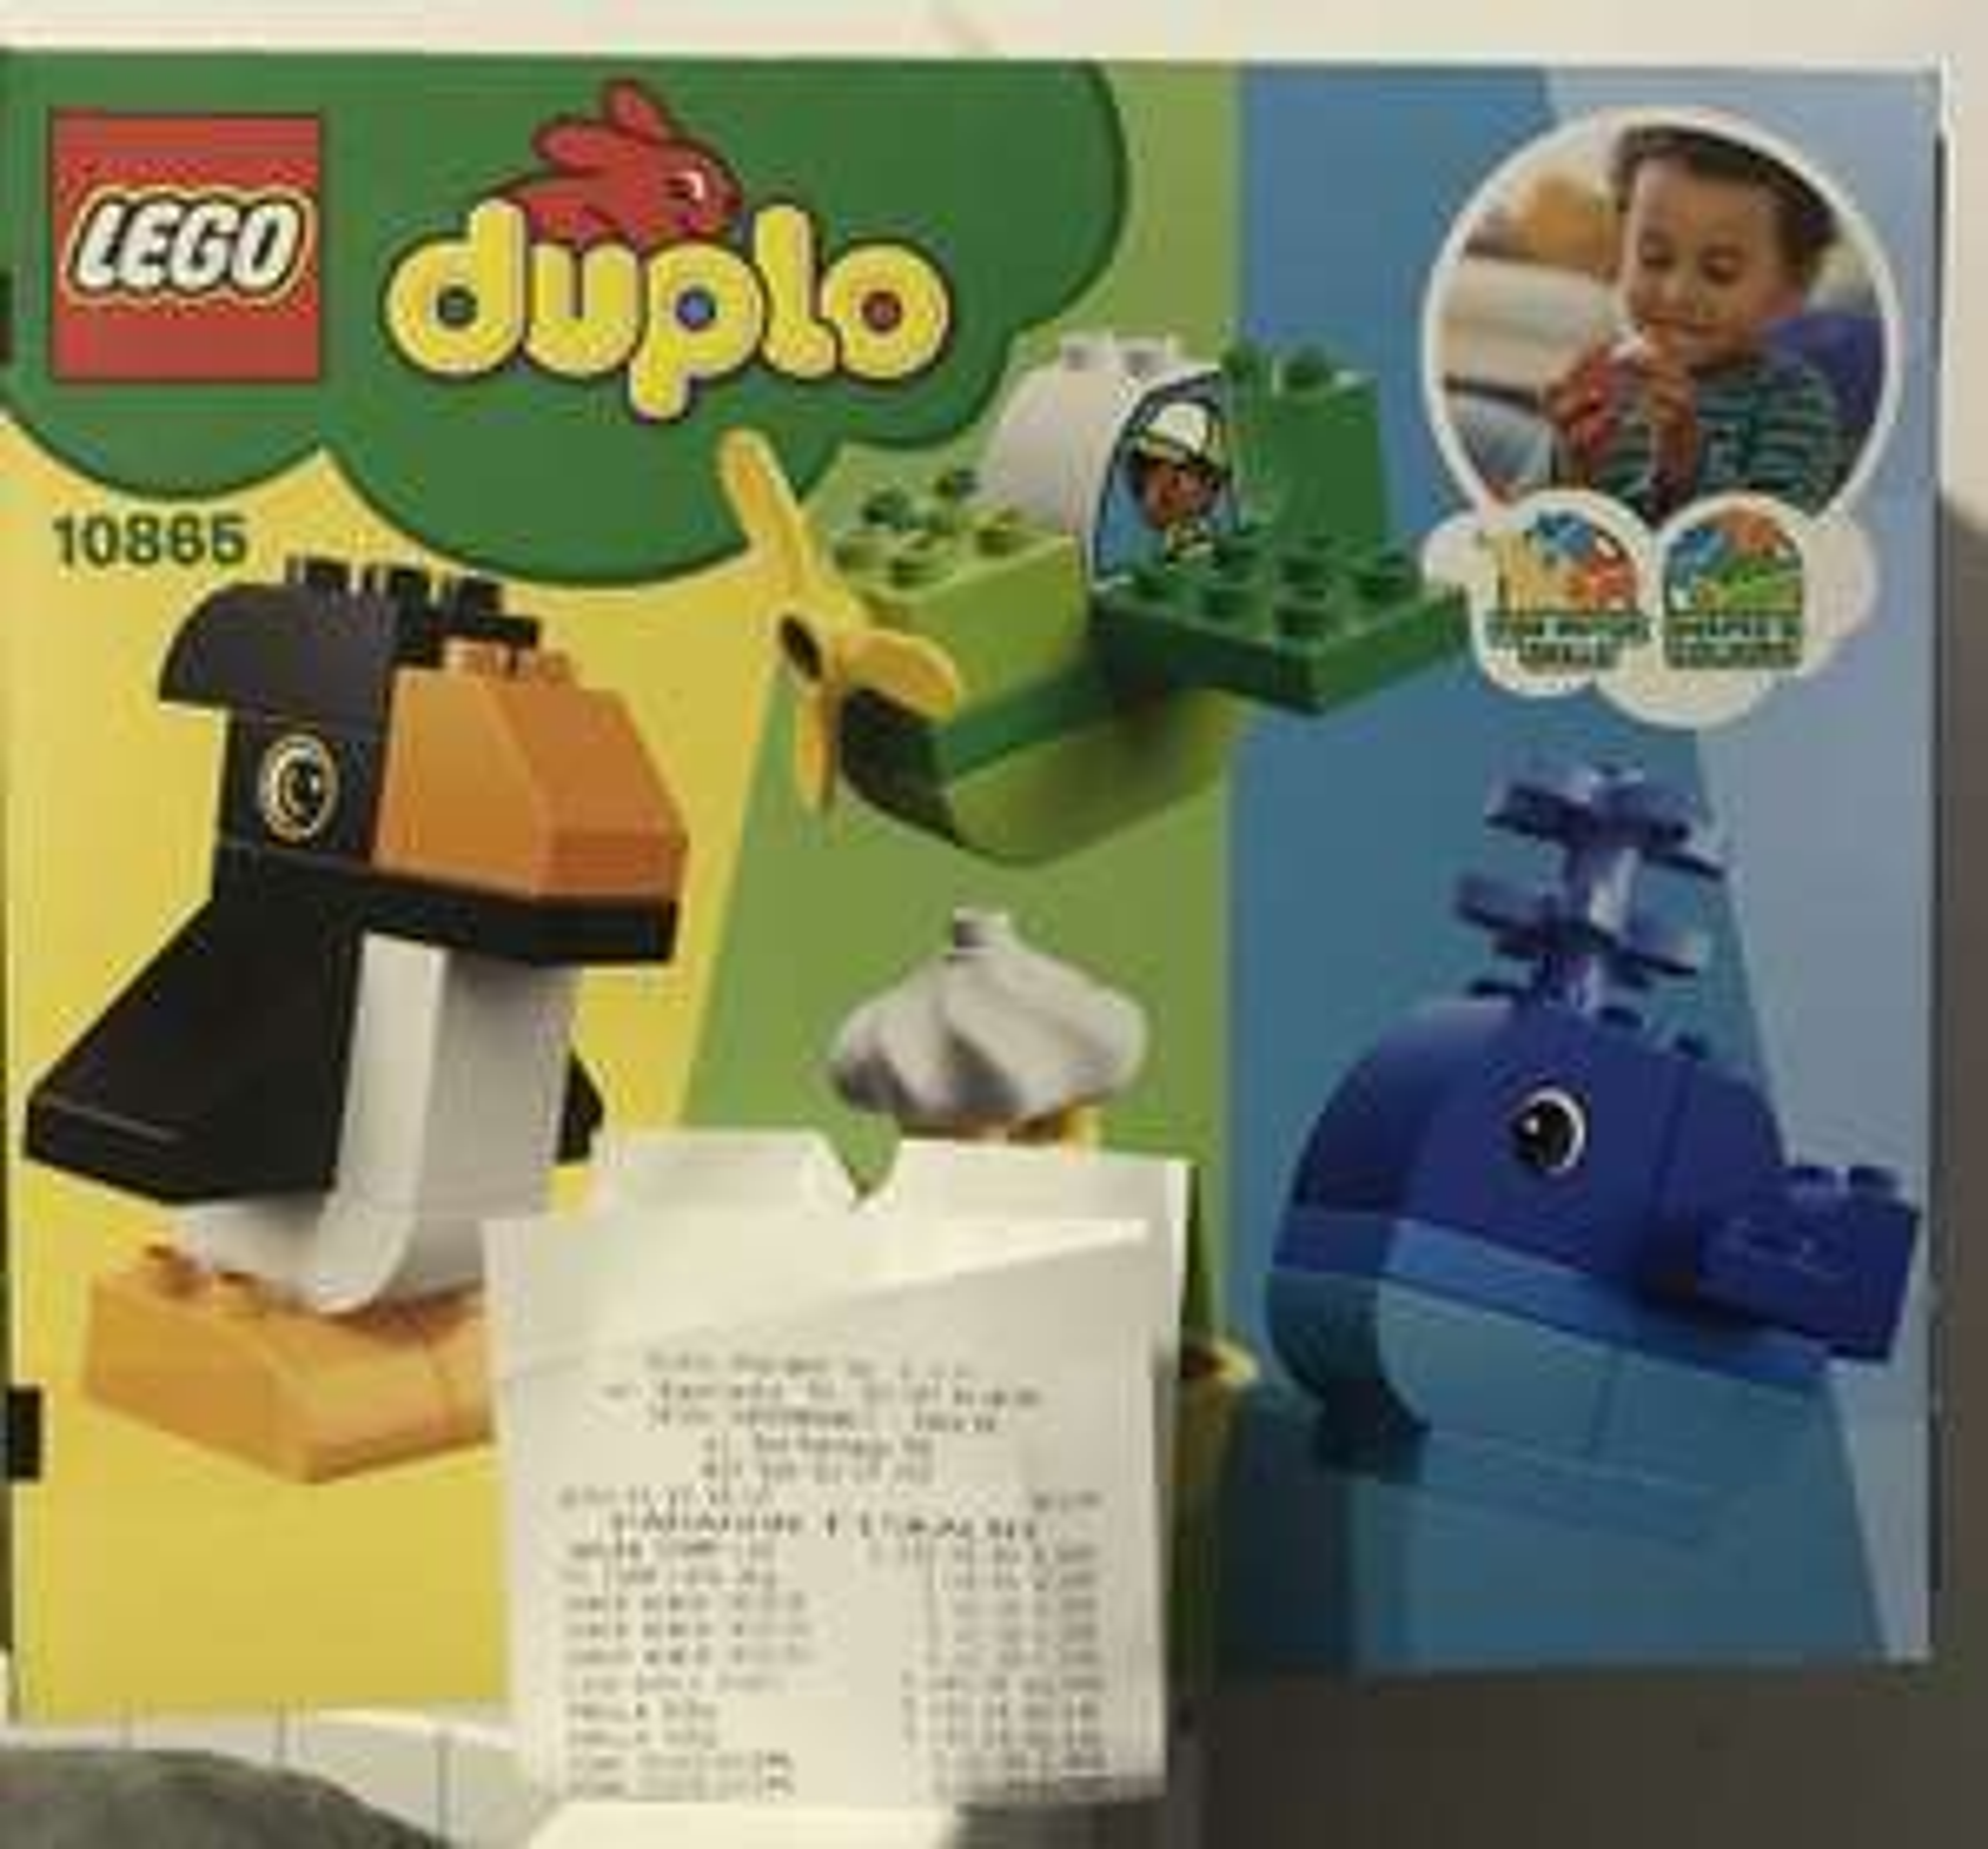 Tesco Radlin Lego Duplo 10865